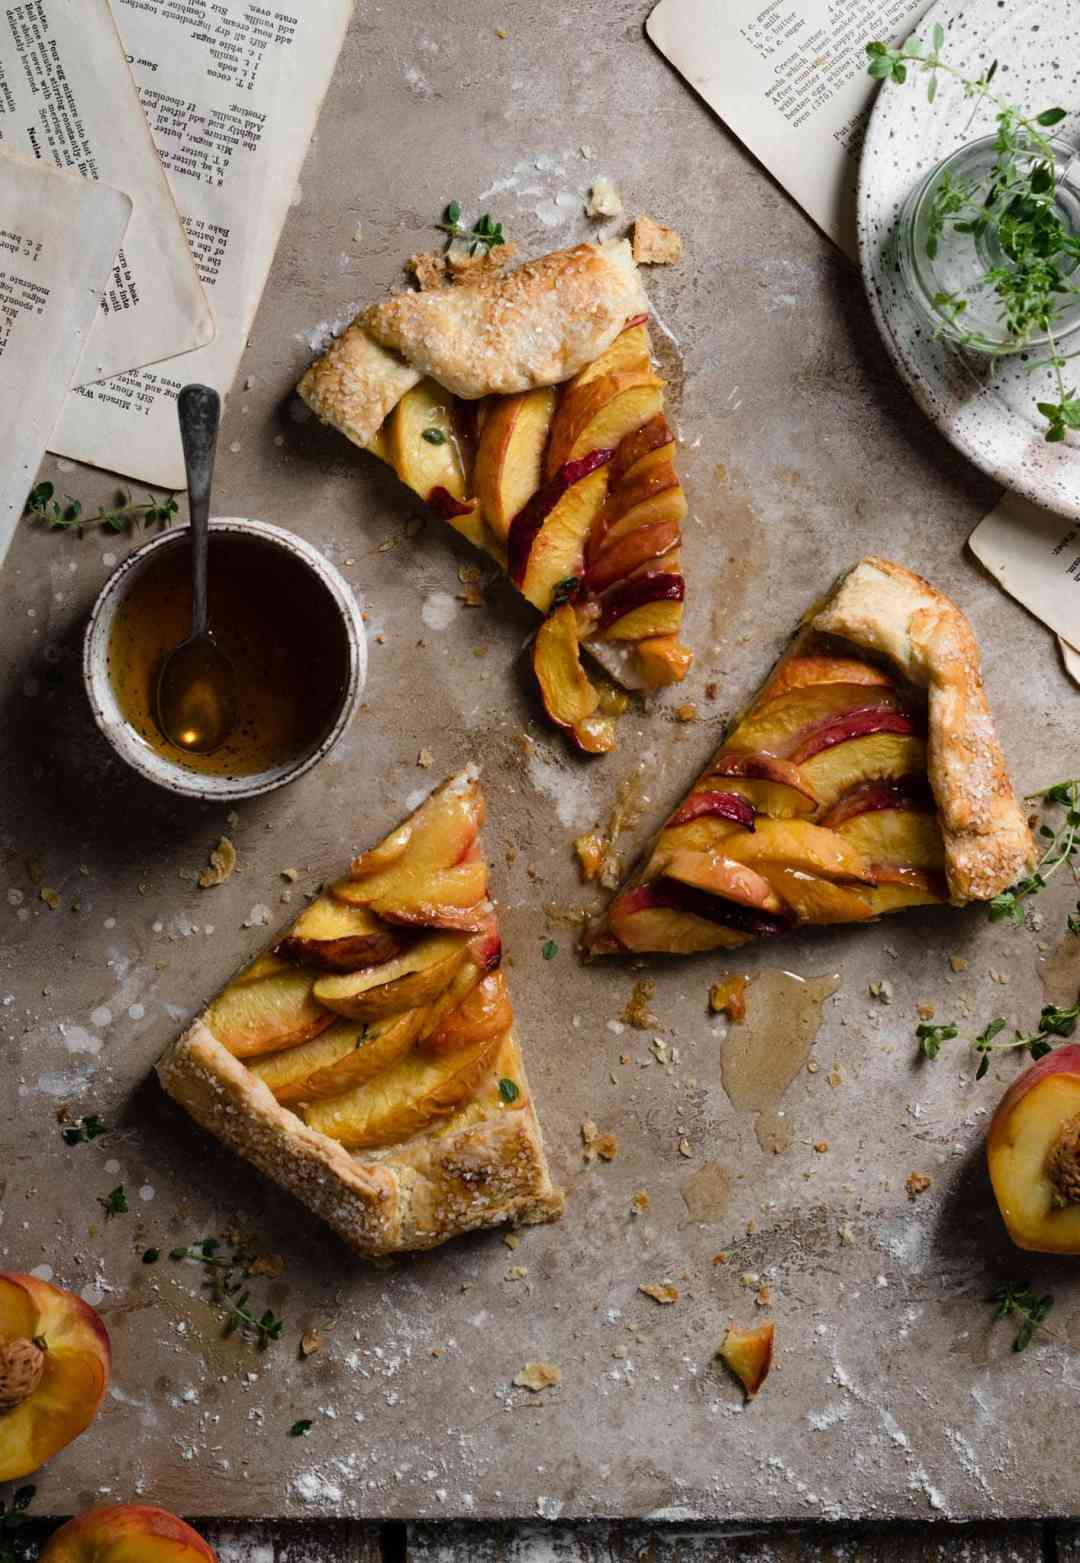 Rustic Tart peach galette with butter crust.